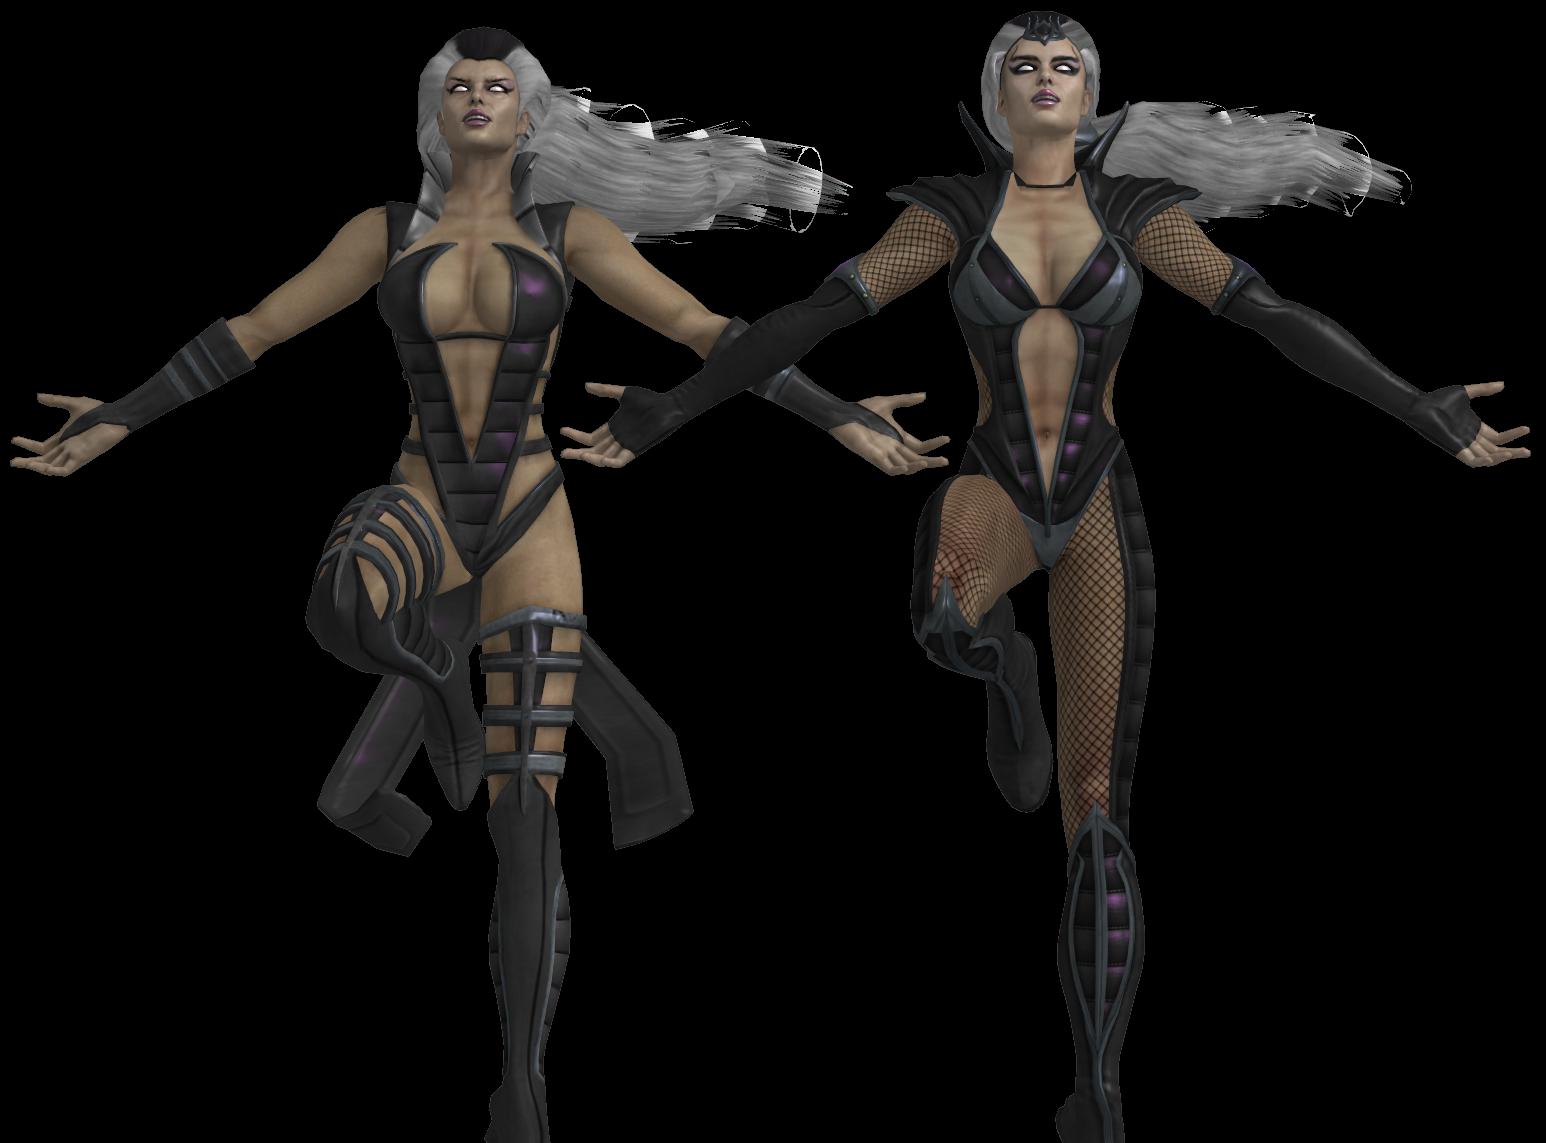 Mortal Kombat Sindel Pack Xnalara By Mkiss333 On Deviantart